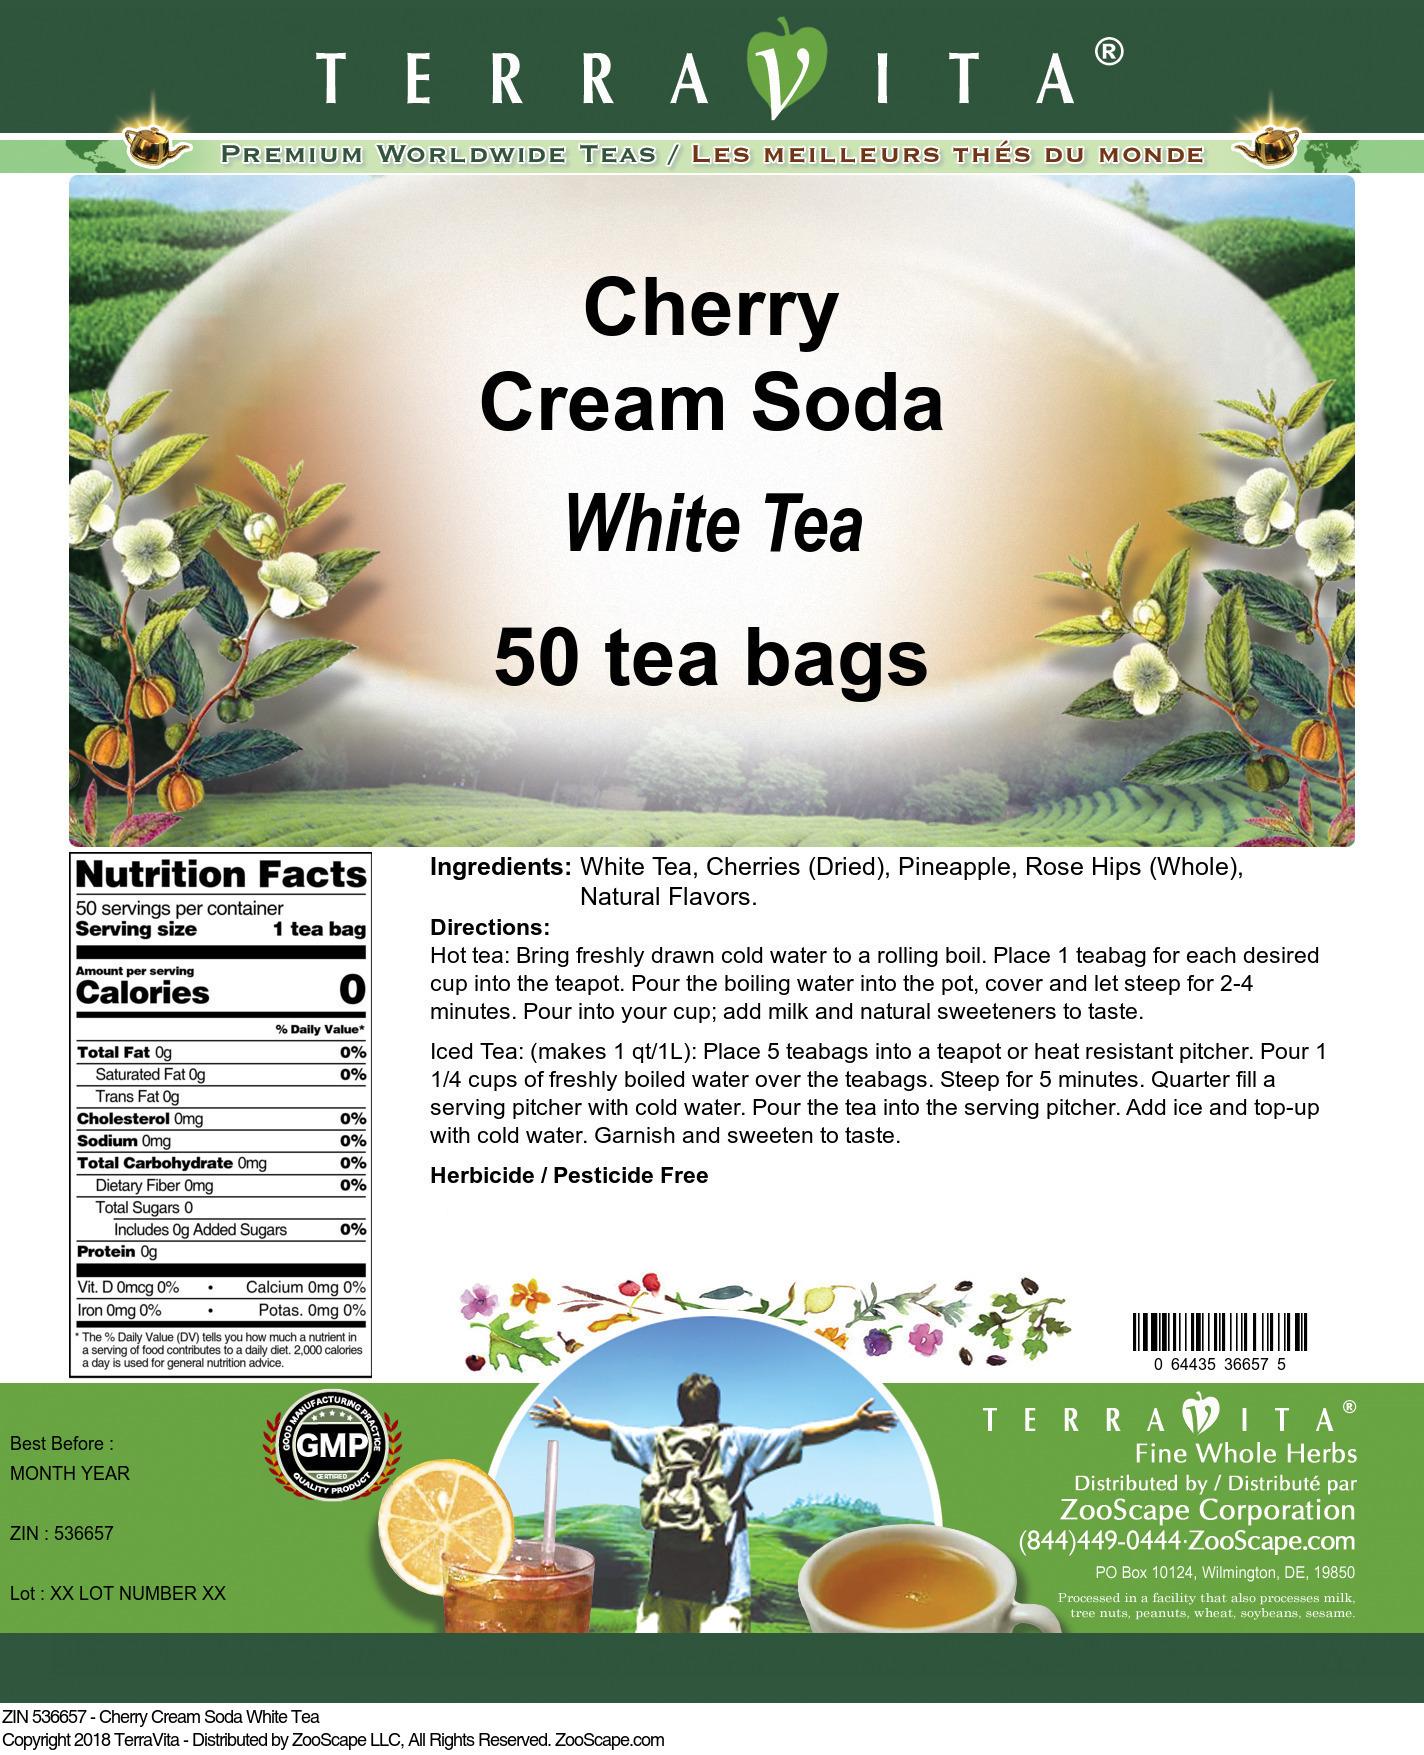 Cherry Cream Soda White Tea